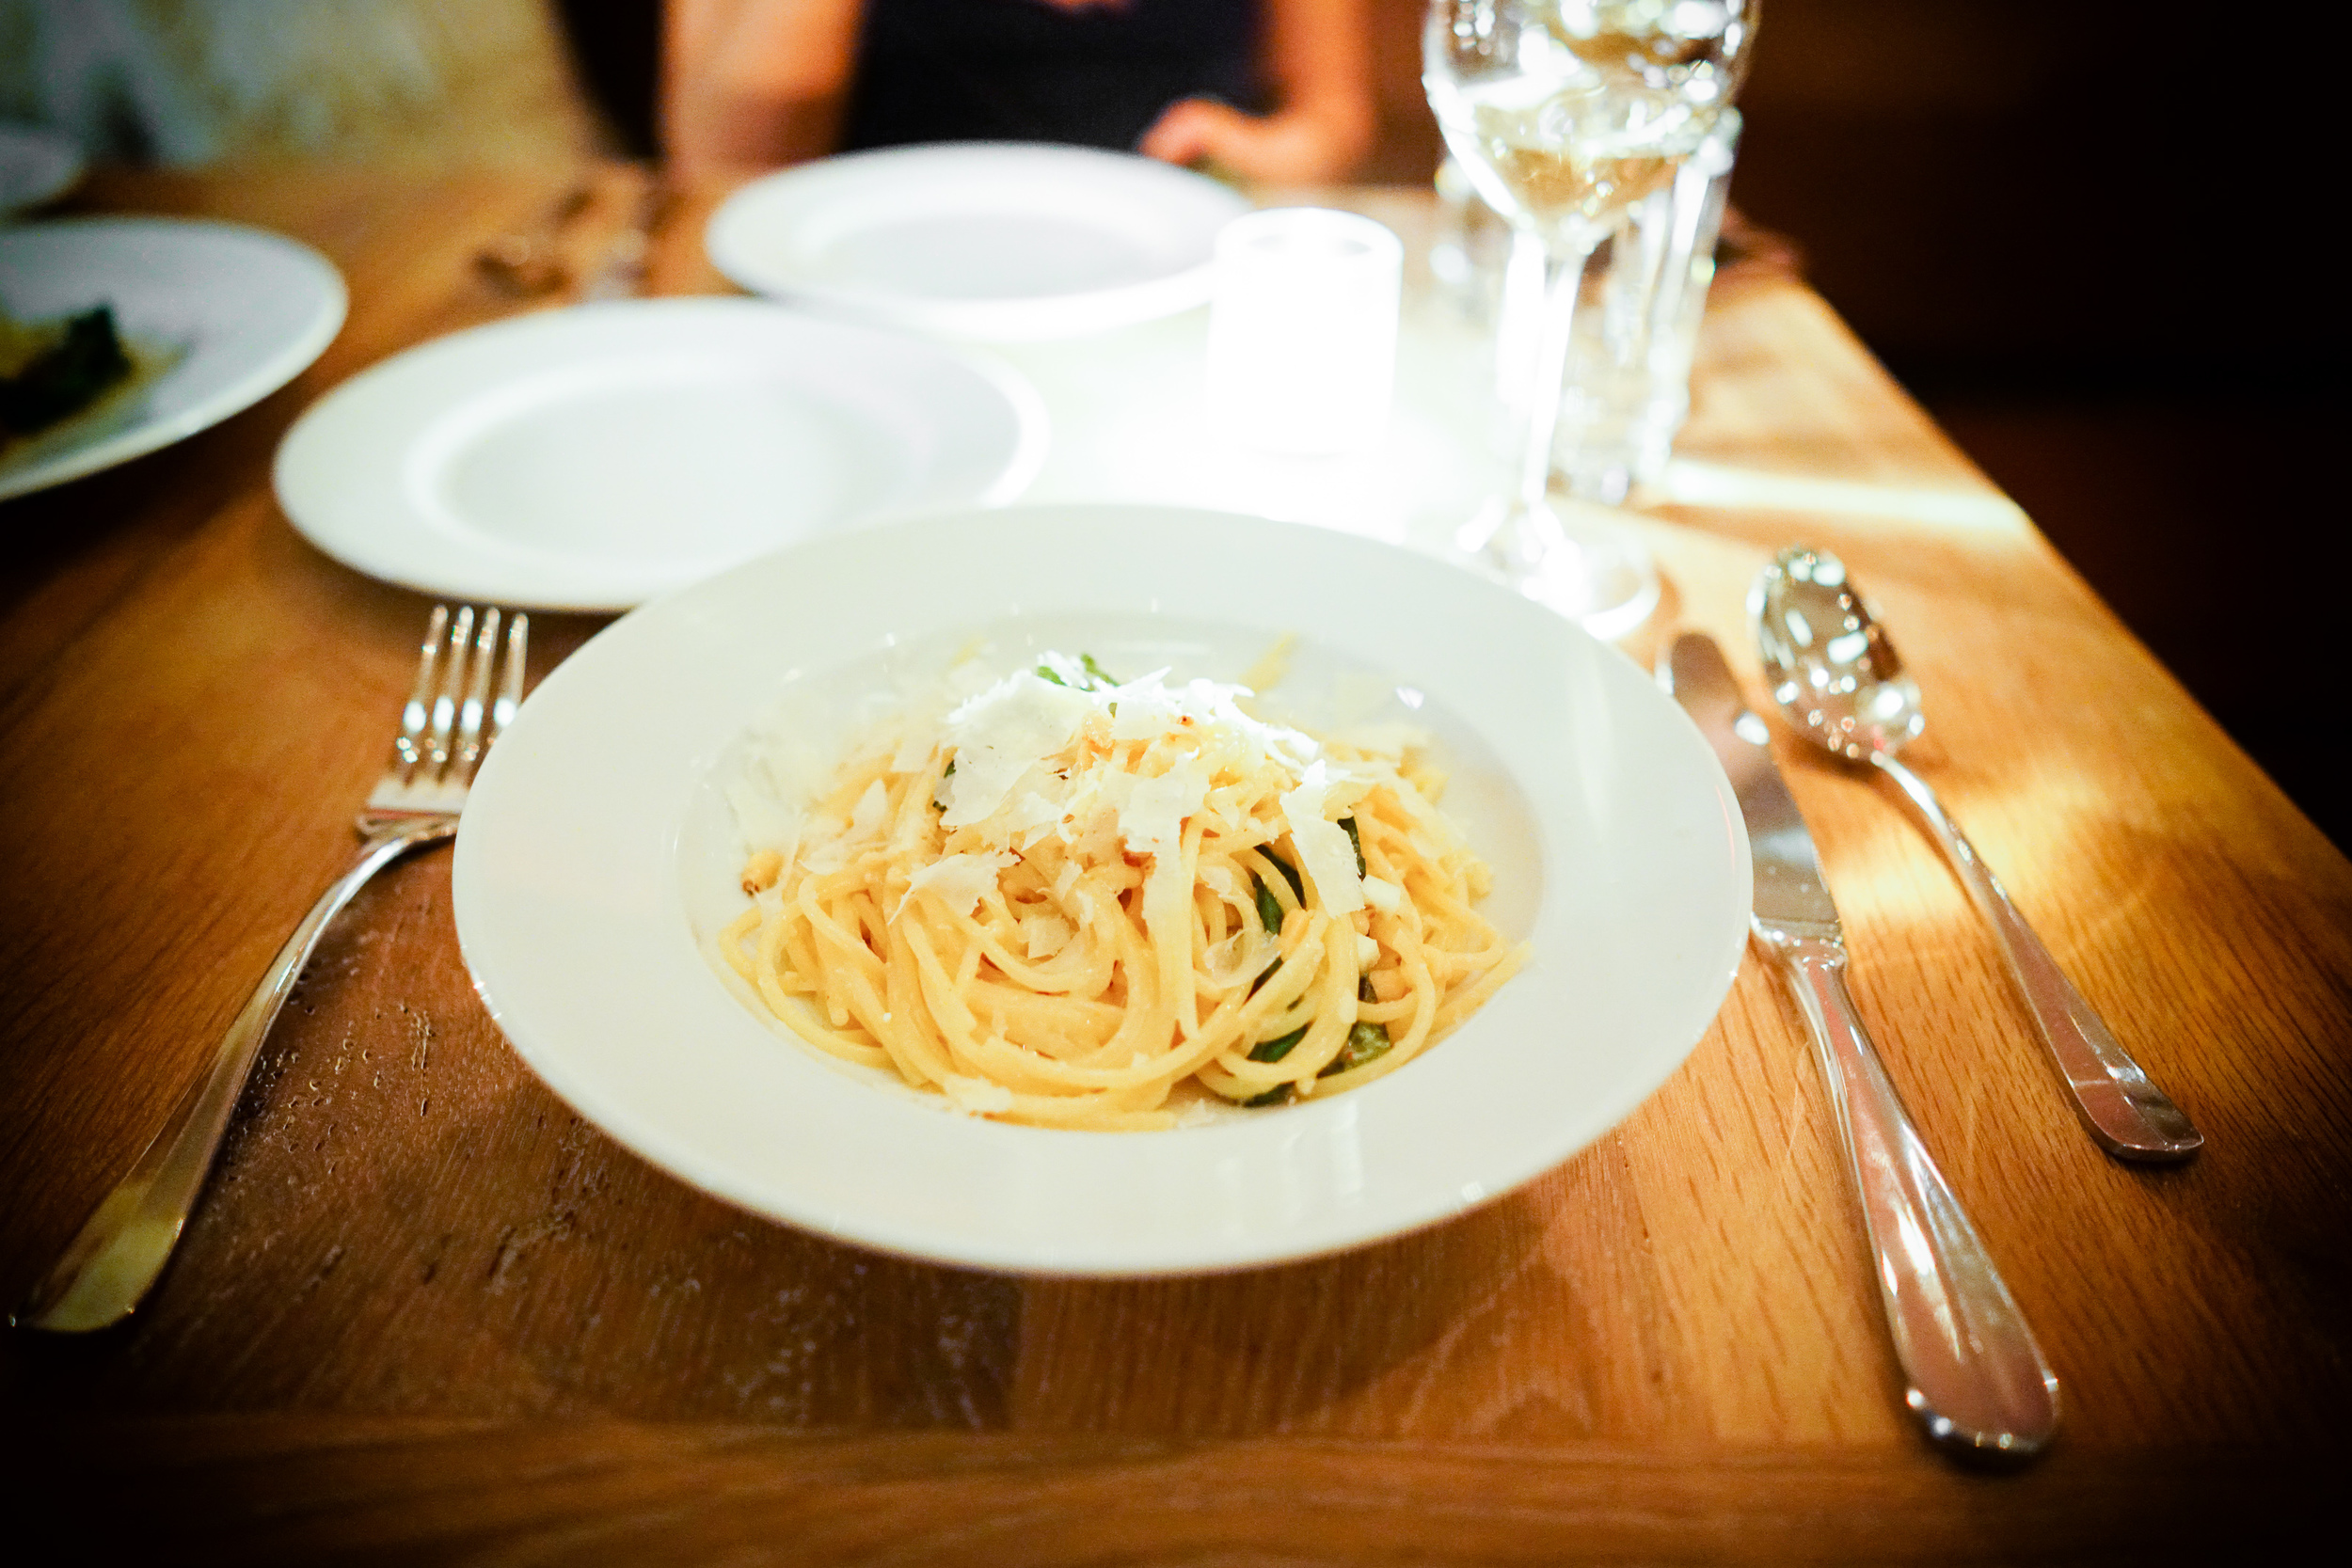 Spaghetti al limone with pinenuts and basil ($19)